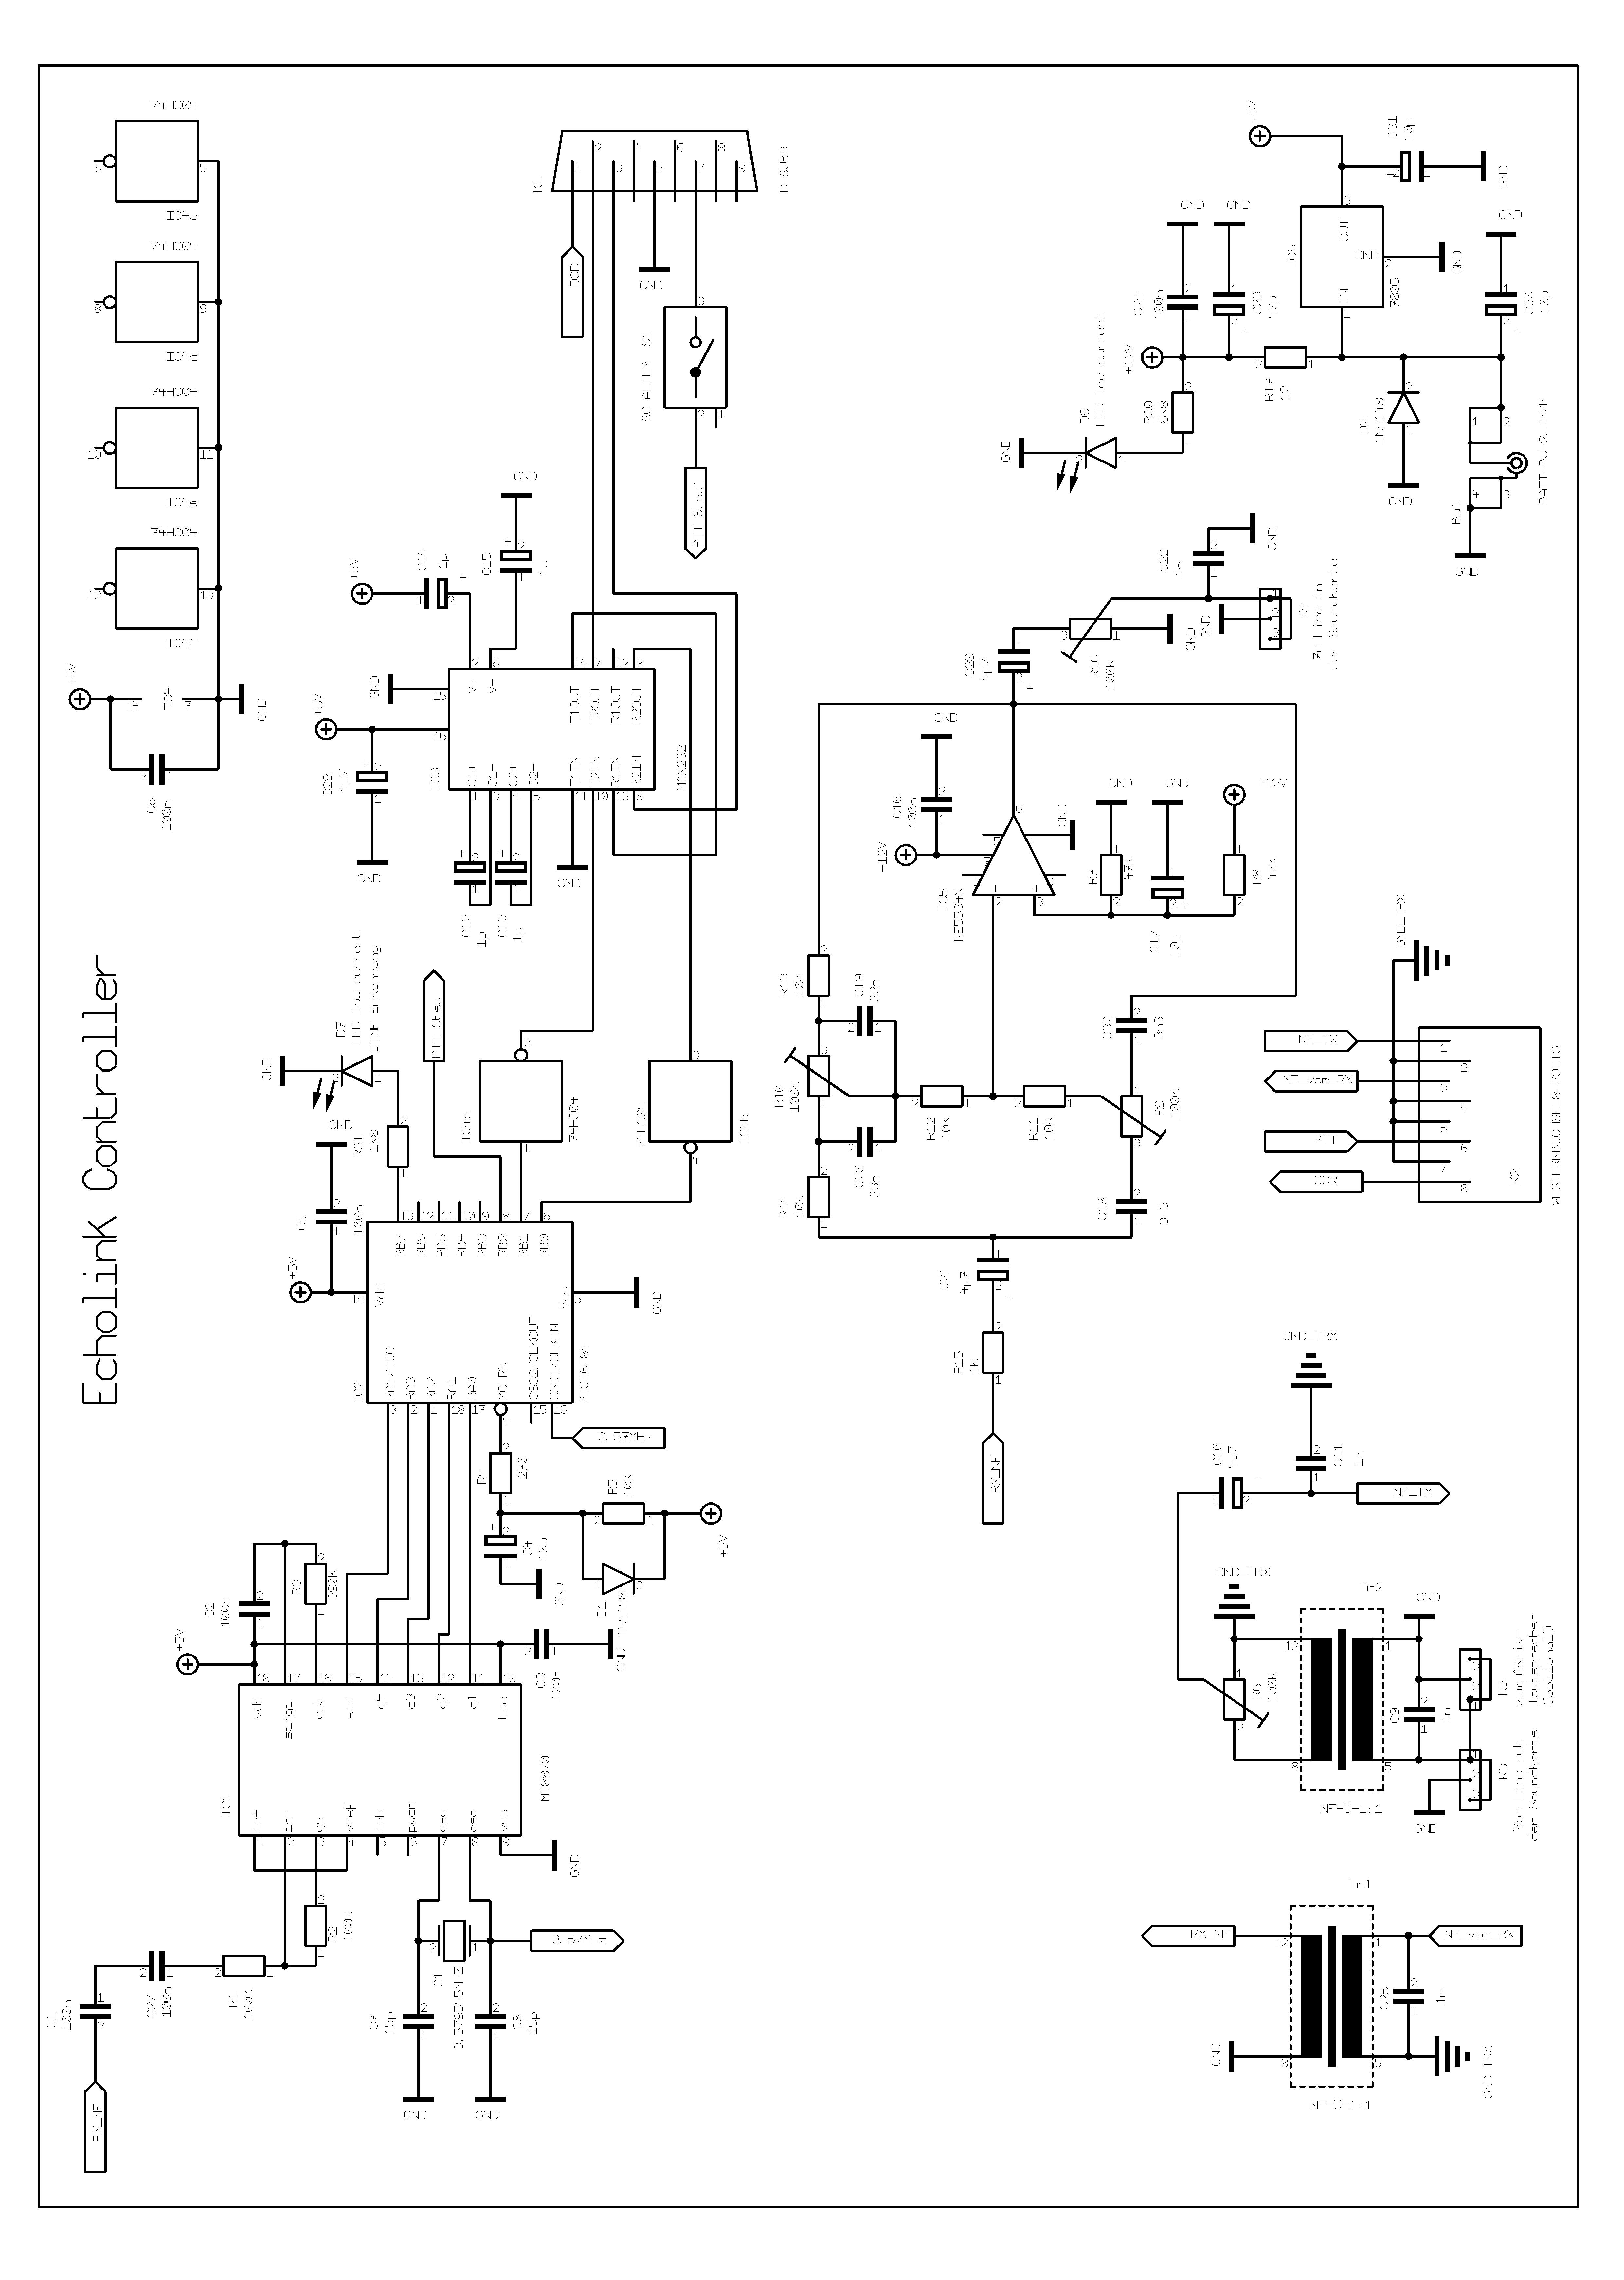 Echolink Controller Dtmf Decoder Circuit Page 1